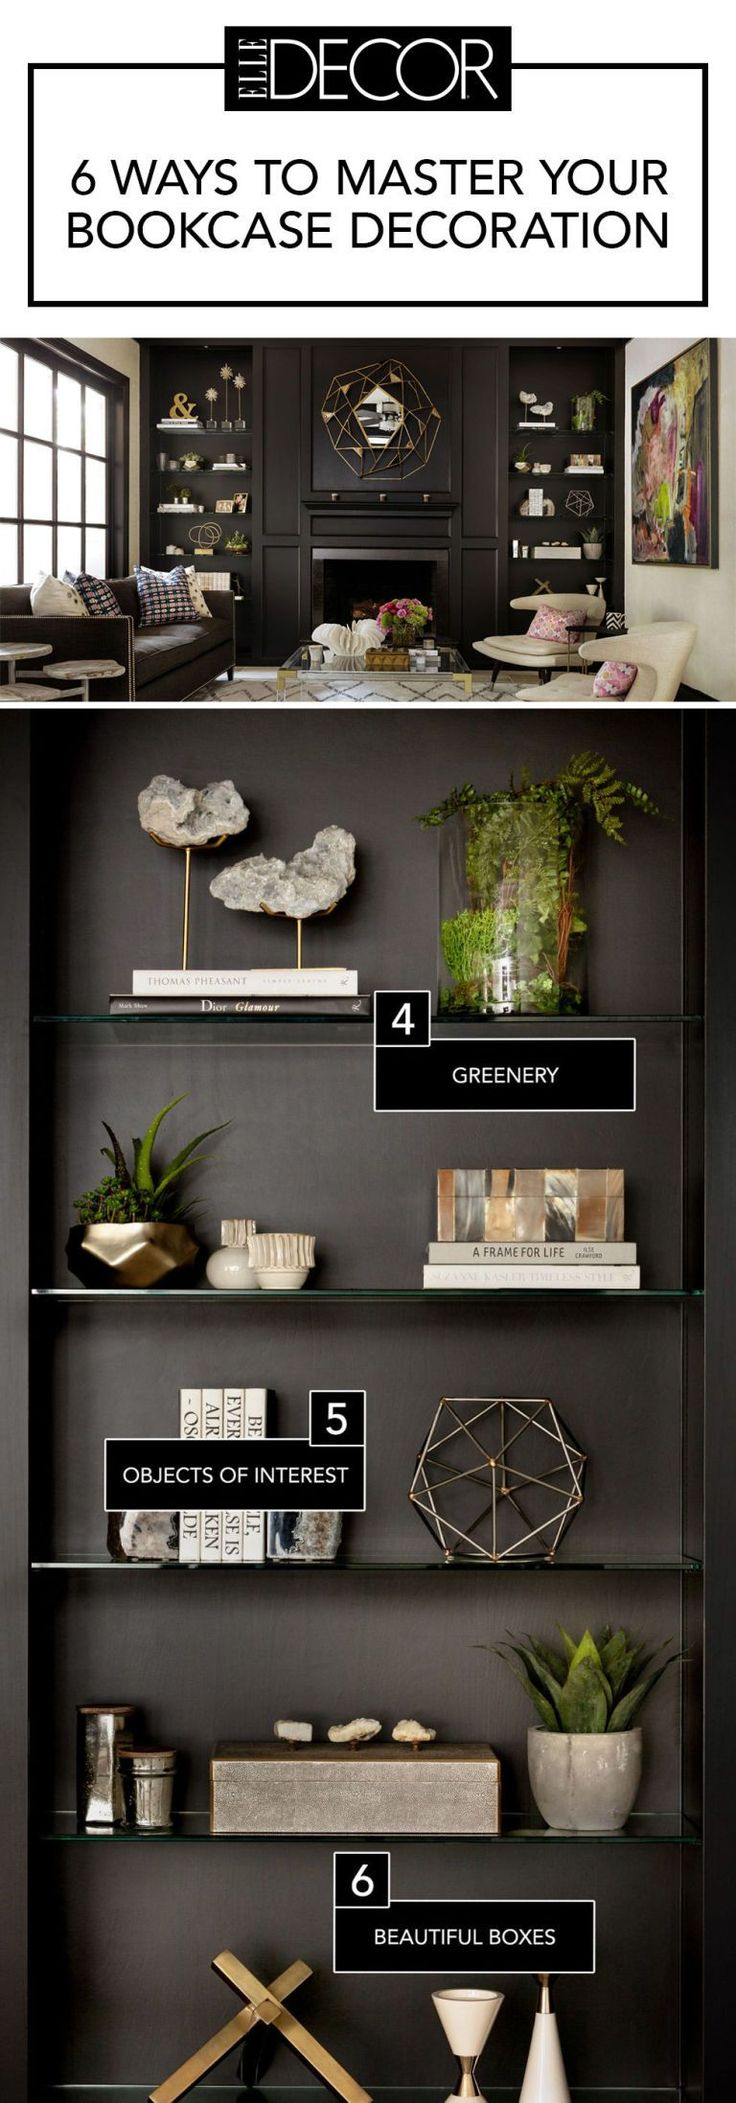 http://www.elledecor.com/design-decorate/how-to/a7960/bookcase-decoration-ideas/